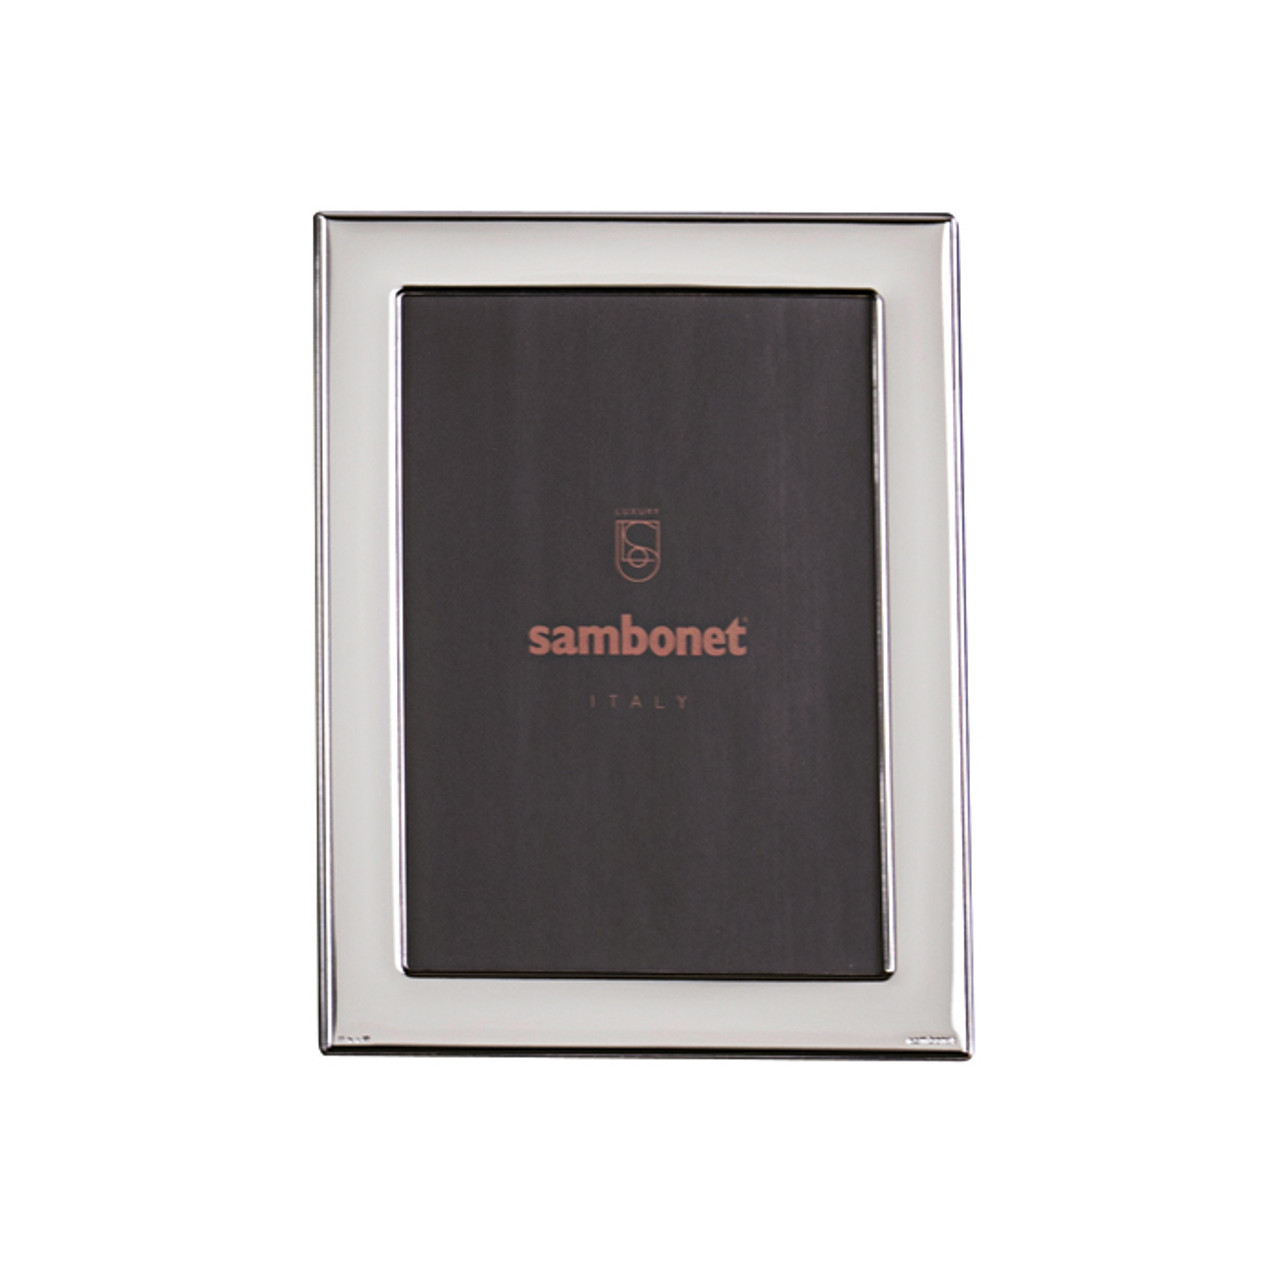 Frames Flat Frame, 5 x 7 inch | Sambonet Online Store